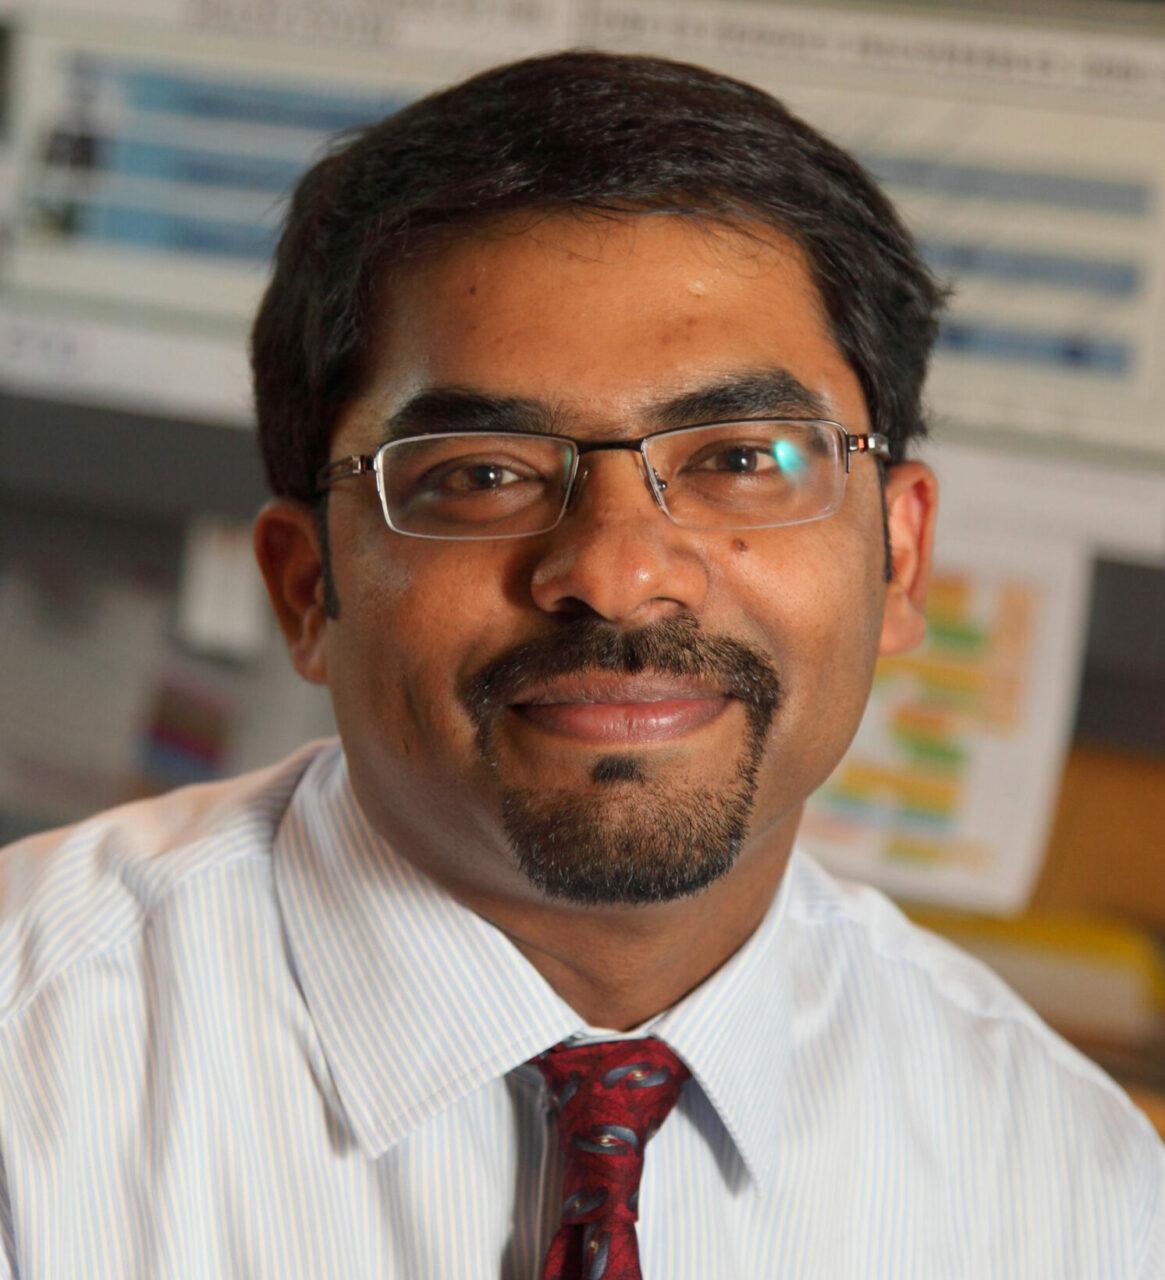 Dr Madhukar Pai cropped aug 2014